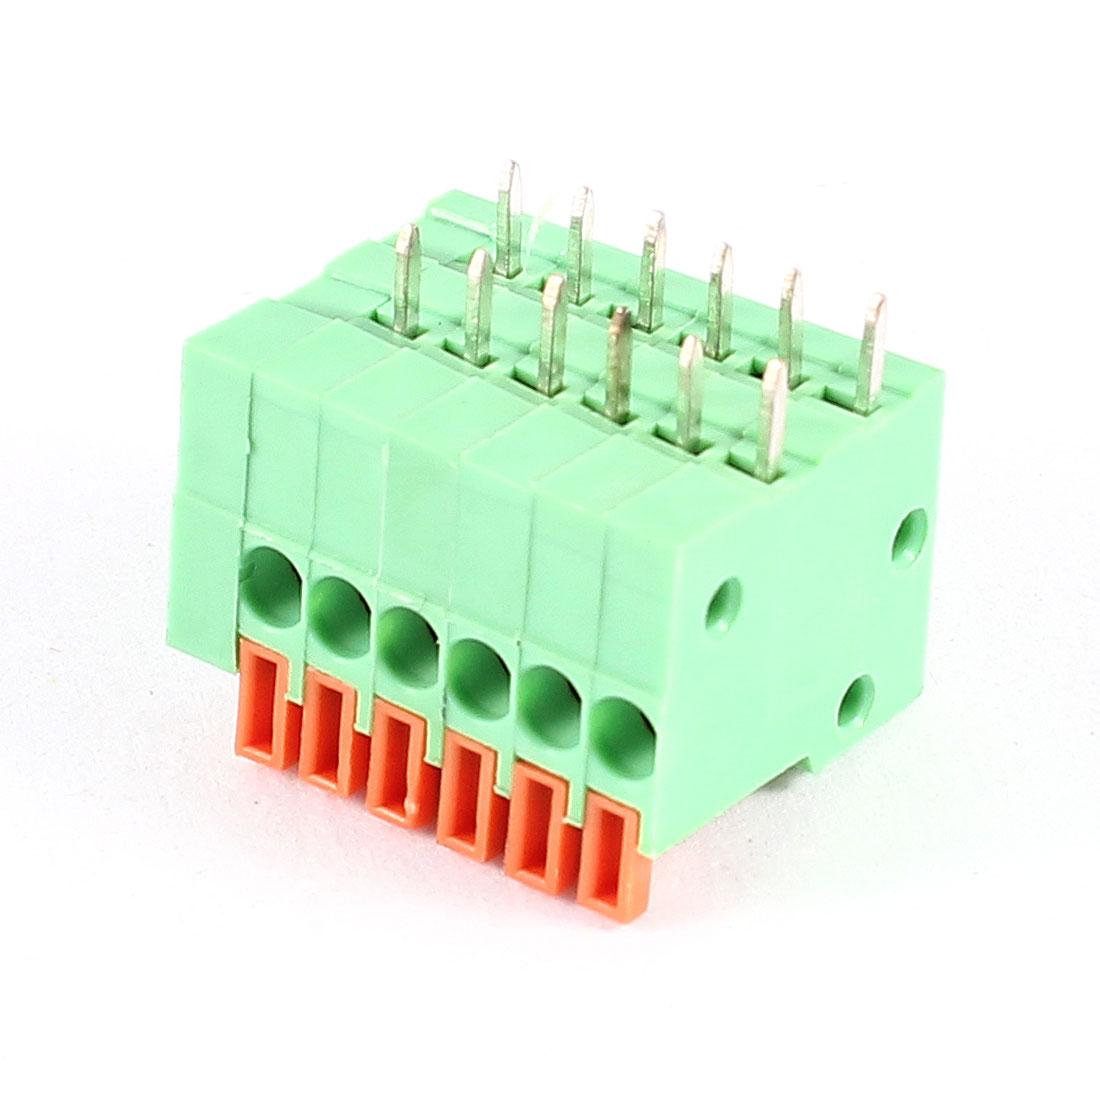 6 Pin Plastic Shell PCB Screwless Terminal Block Green 6P